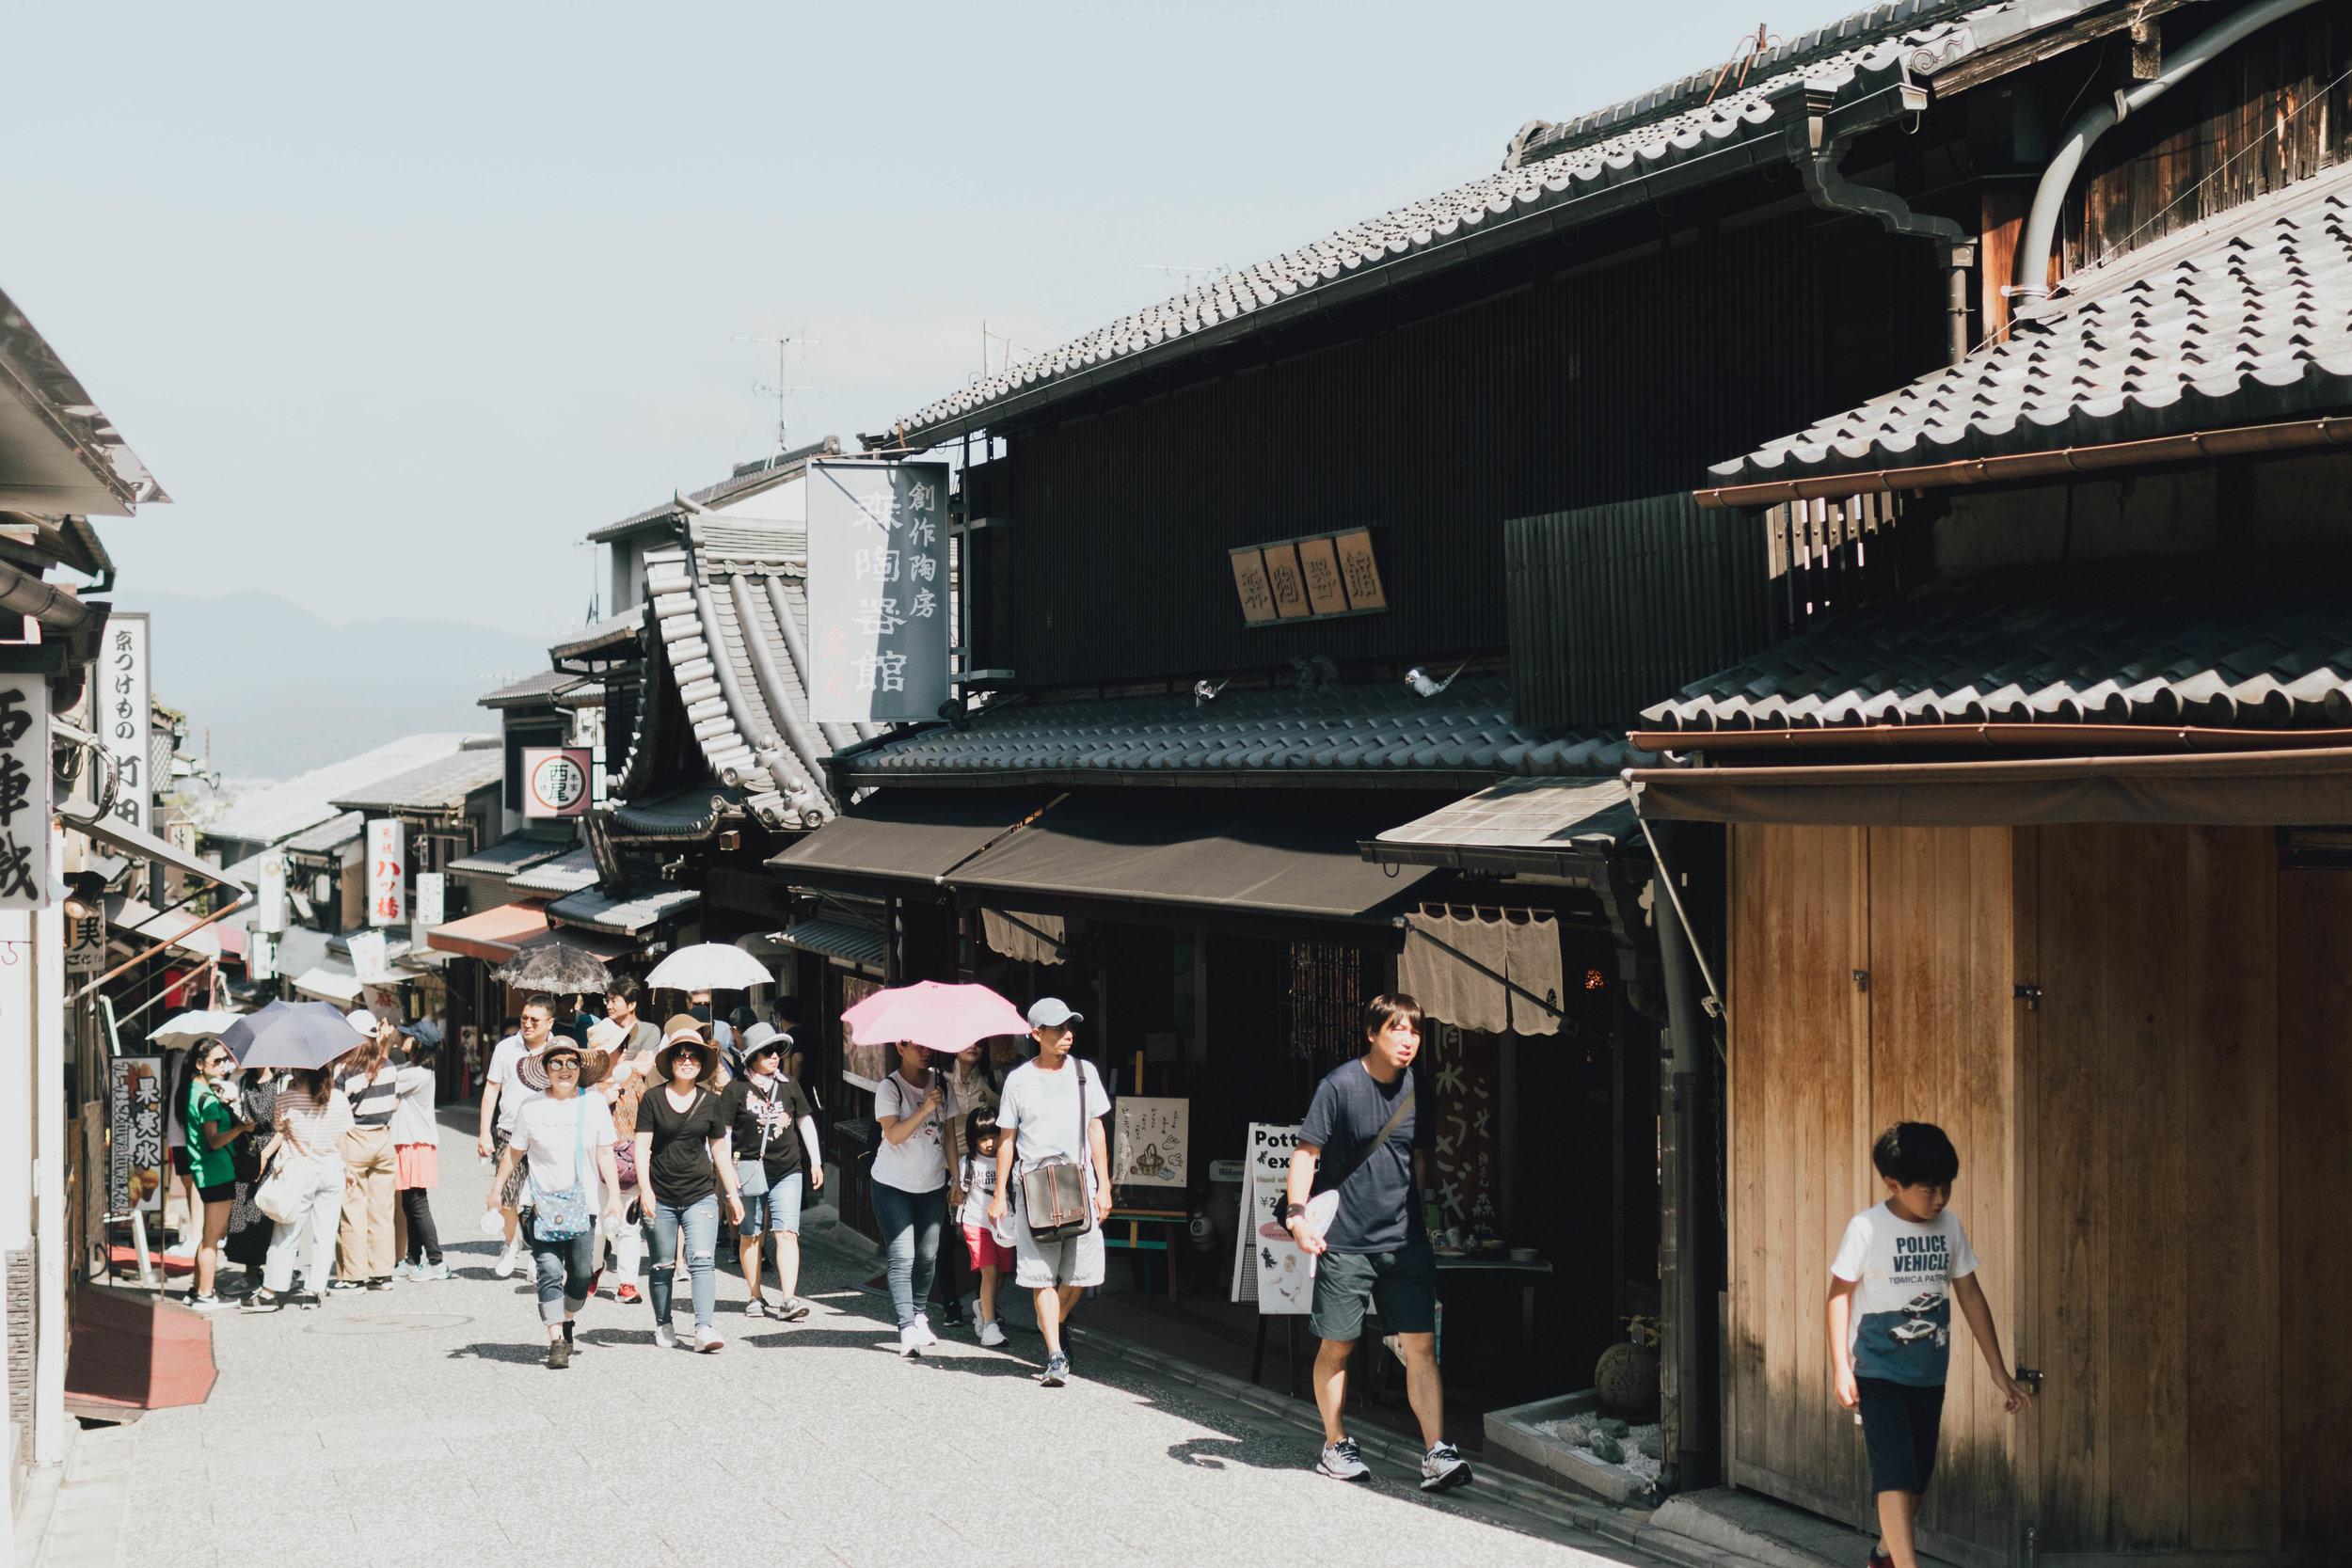 kyoto-gion-photos-by-samantha-look.jpg